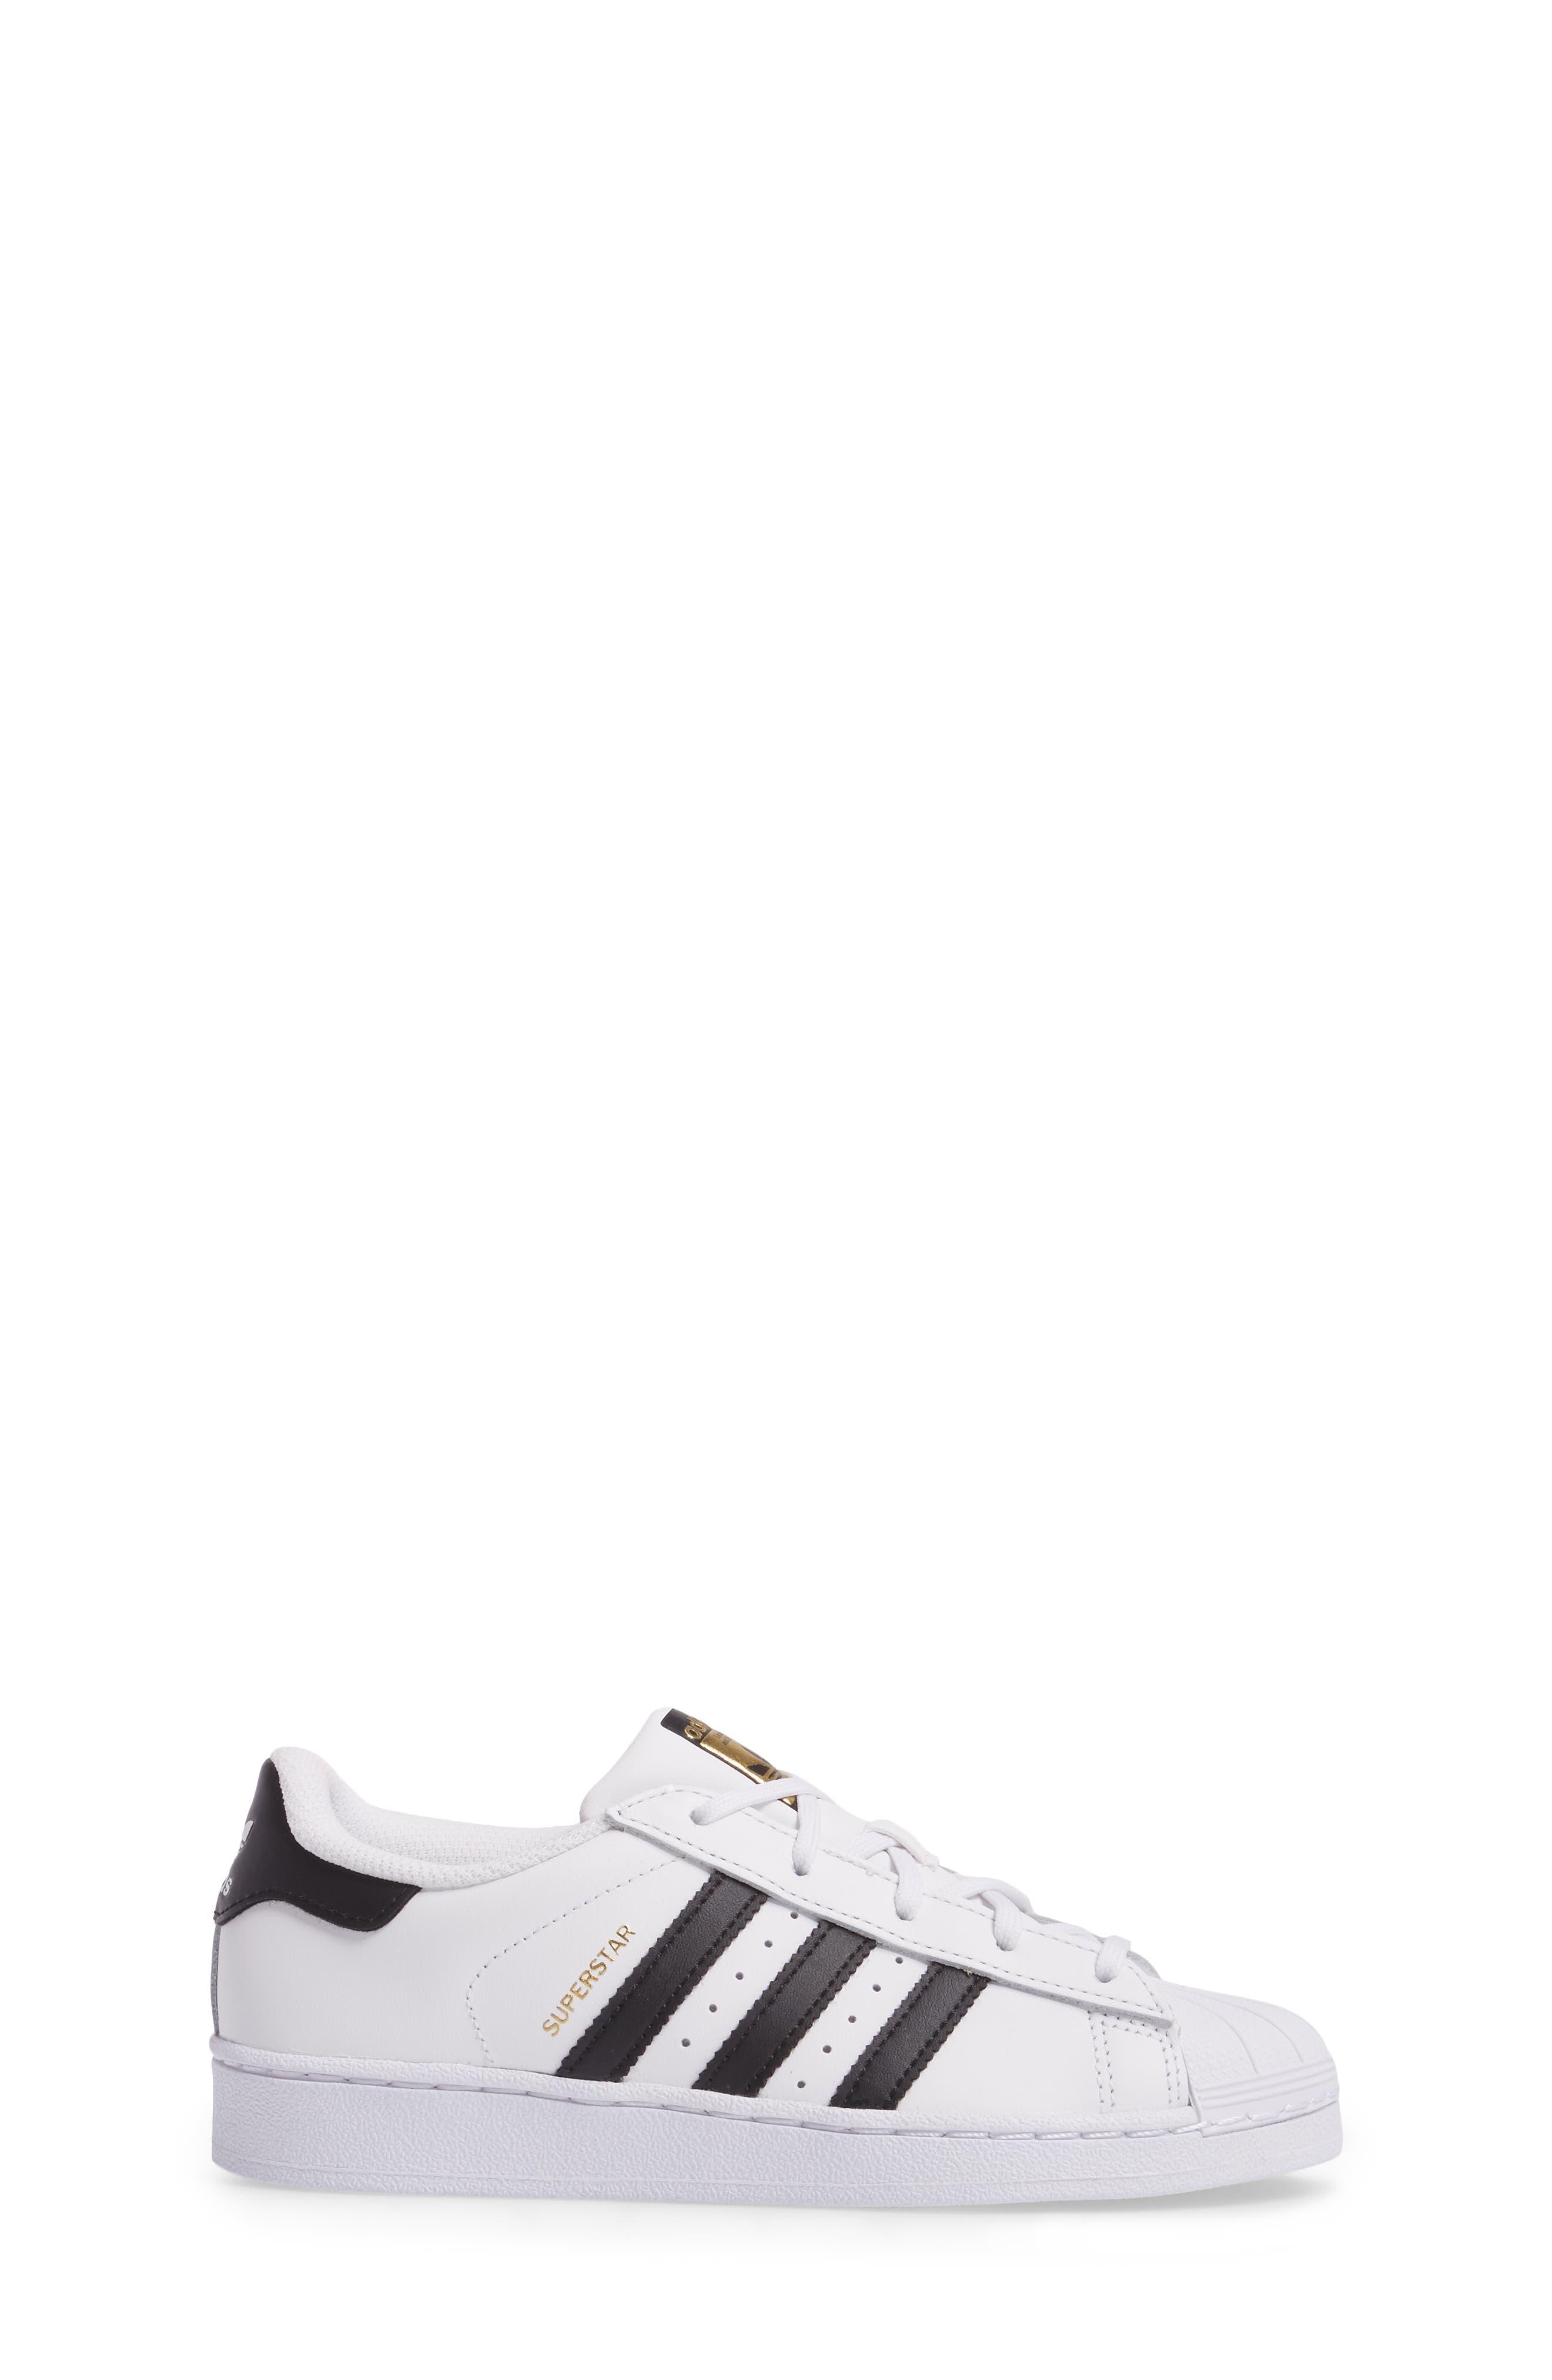 'Superstar Foundation' Sneaker,                             Alternate thumbnail 3, color,                             100